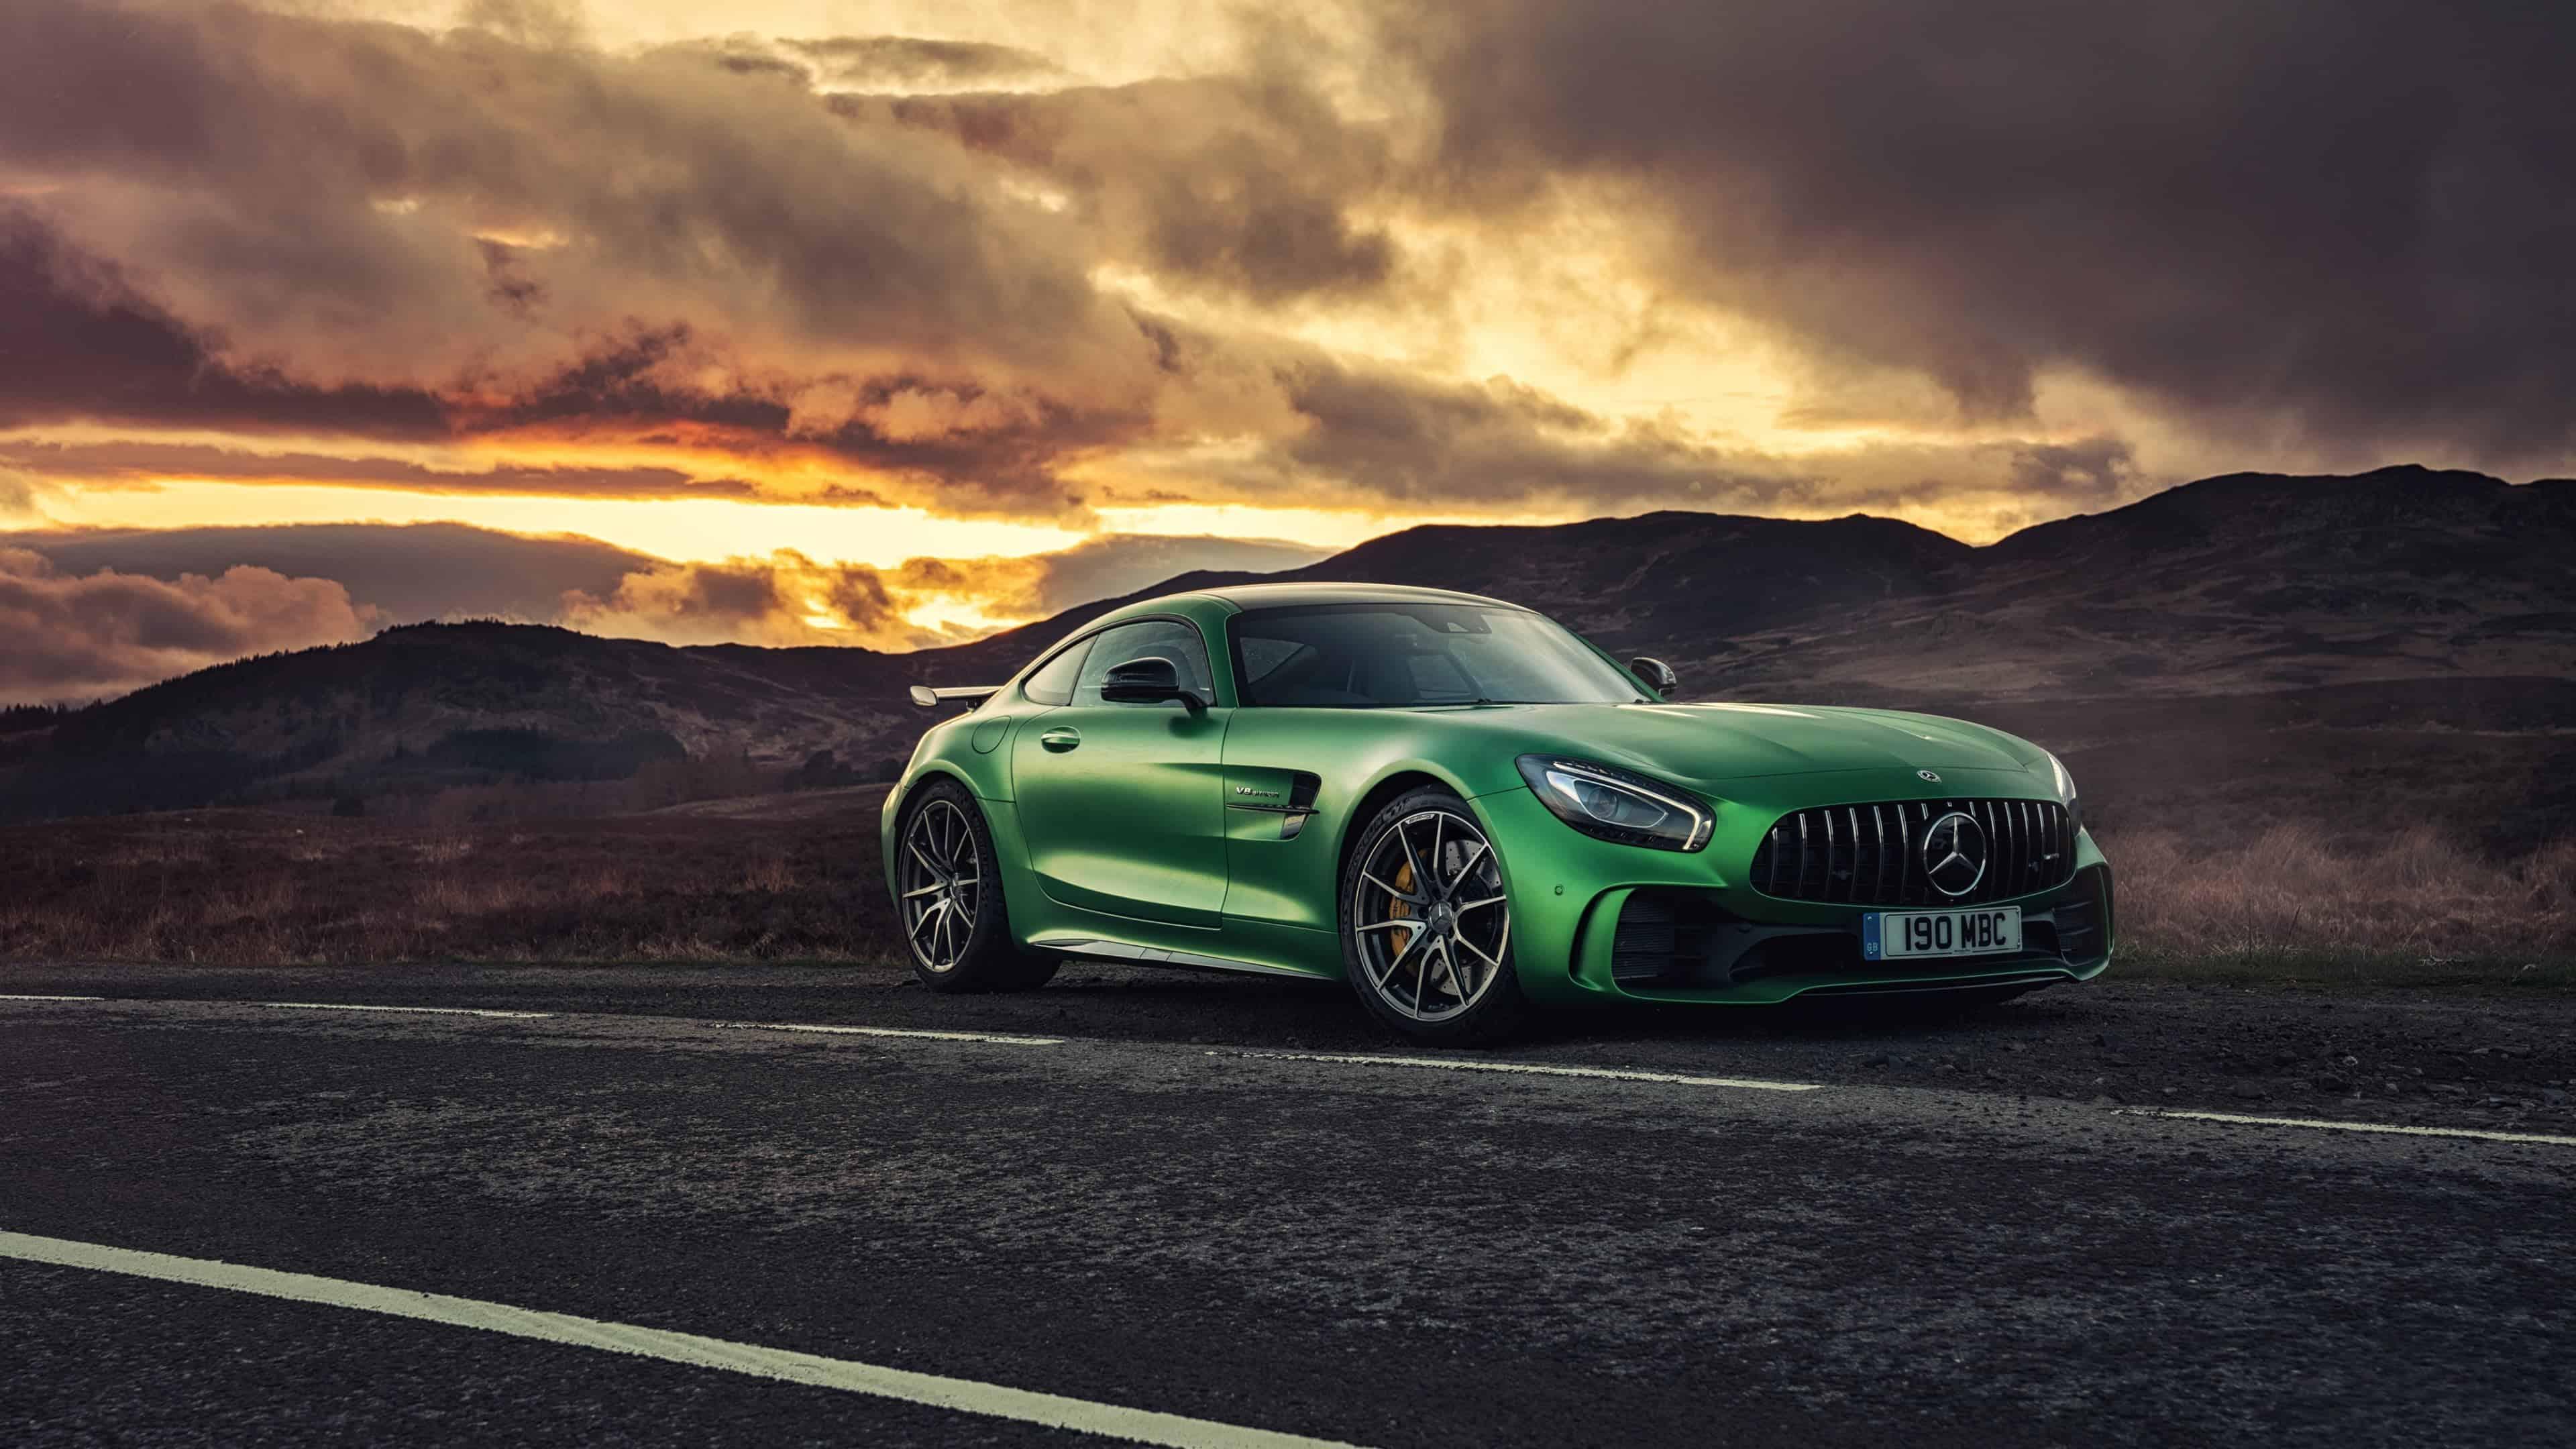 Mercedes Benz Amg Gt >> Mercedes-AMG GT R UHD 4K Wallpaper | Pixelz